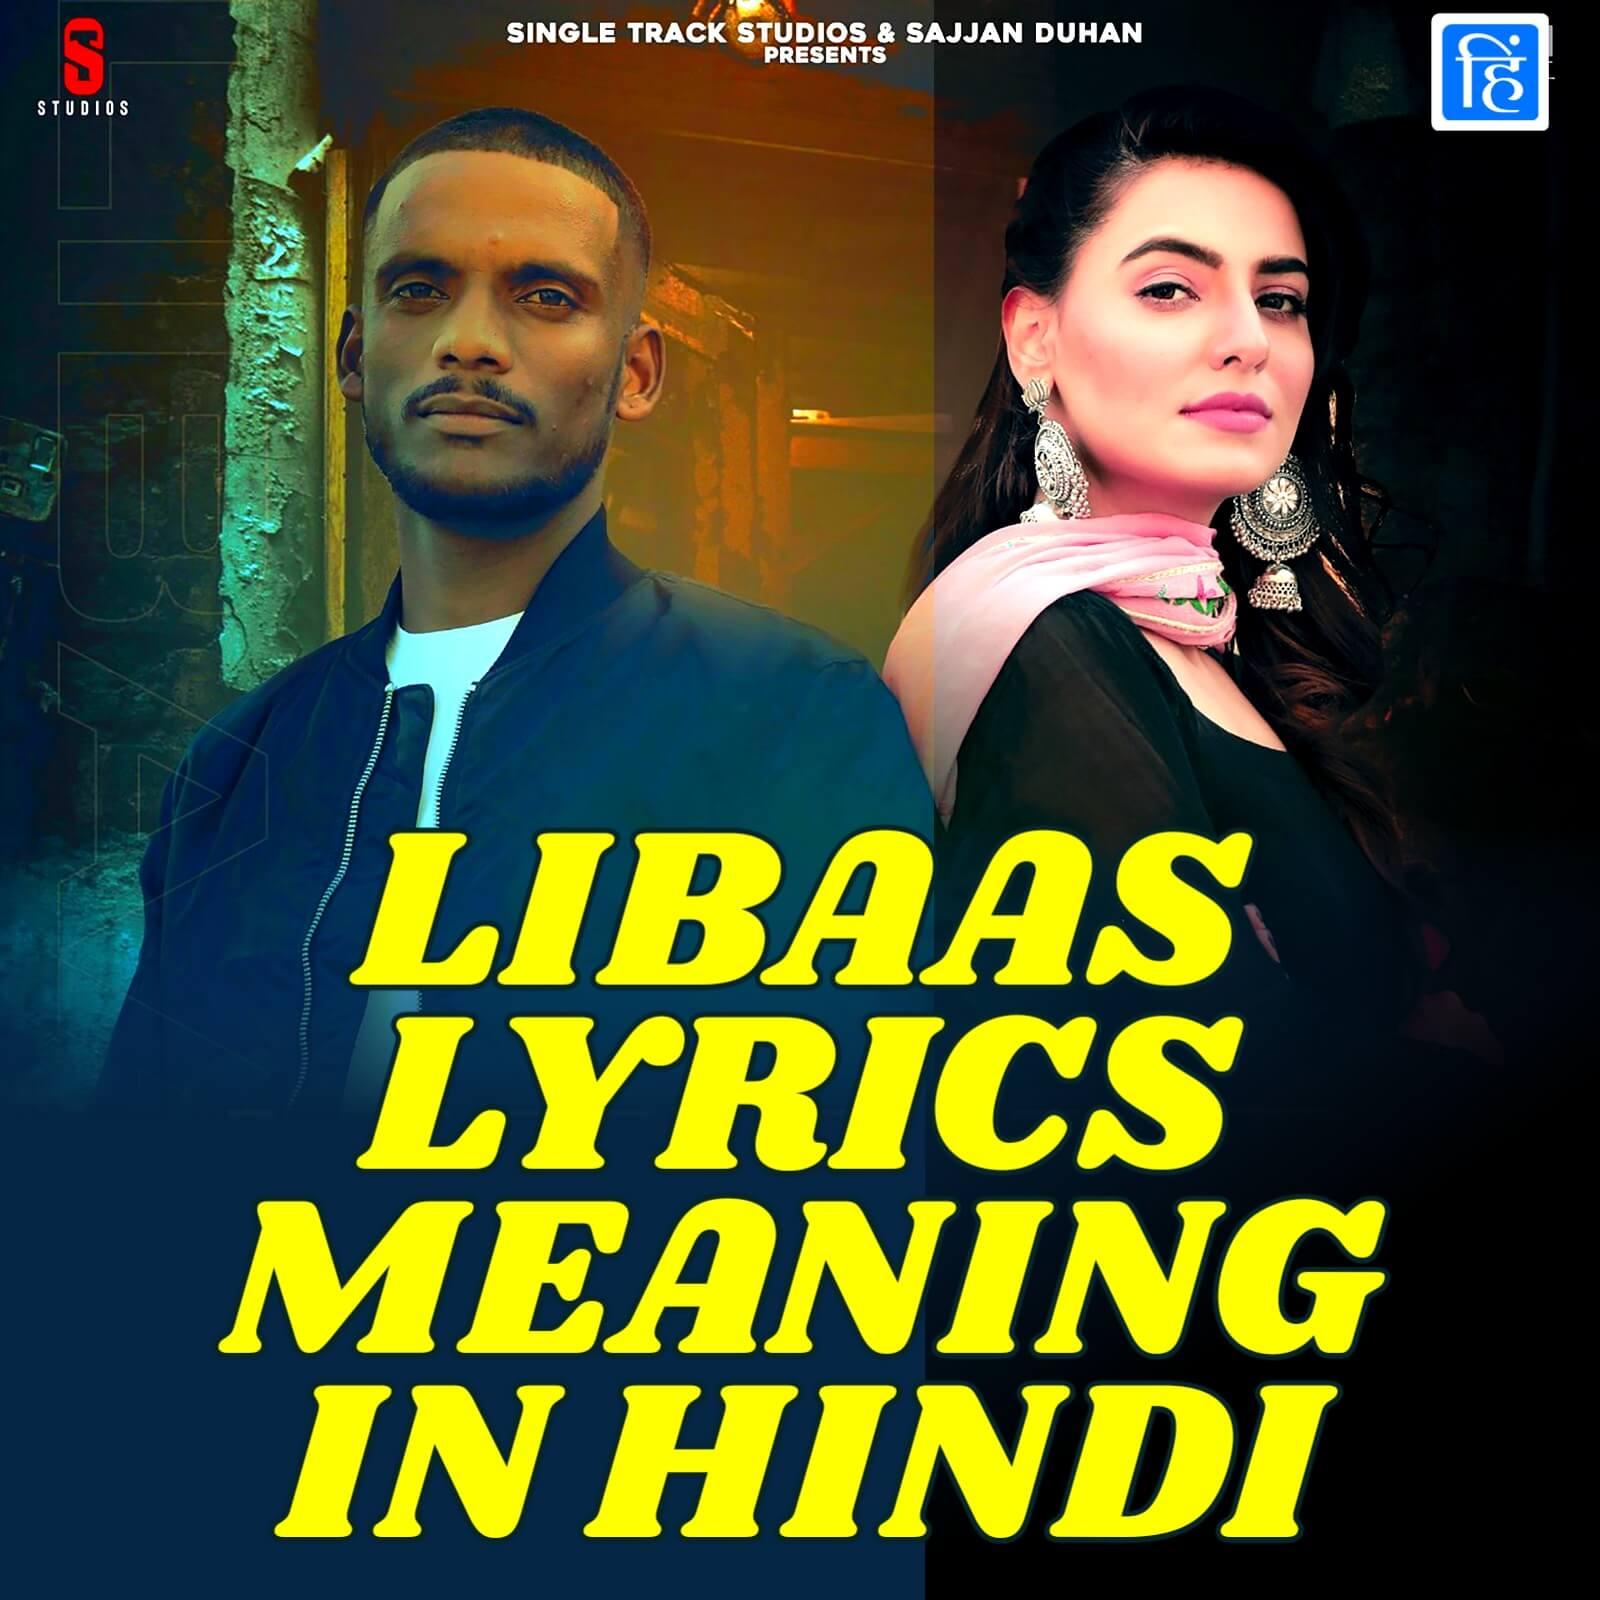 Kaka - Kaale Je Libaas Song Lyrics Meaning (Translation) In Hindi